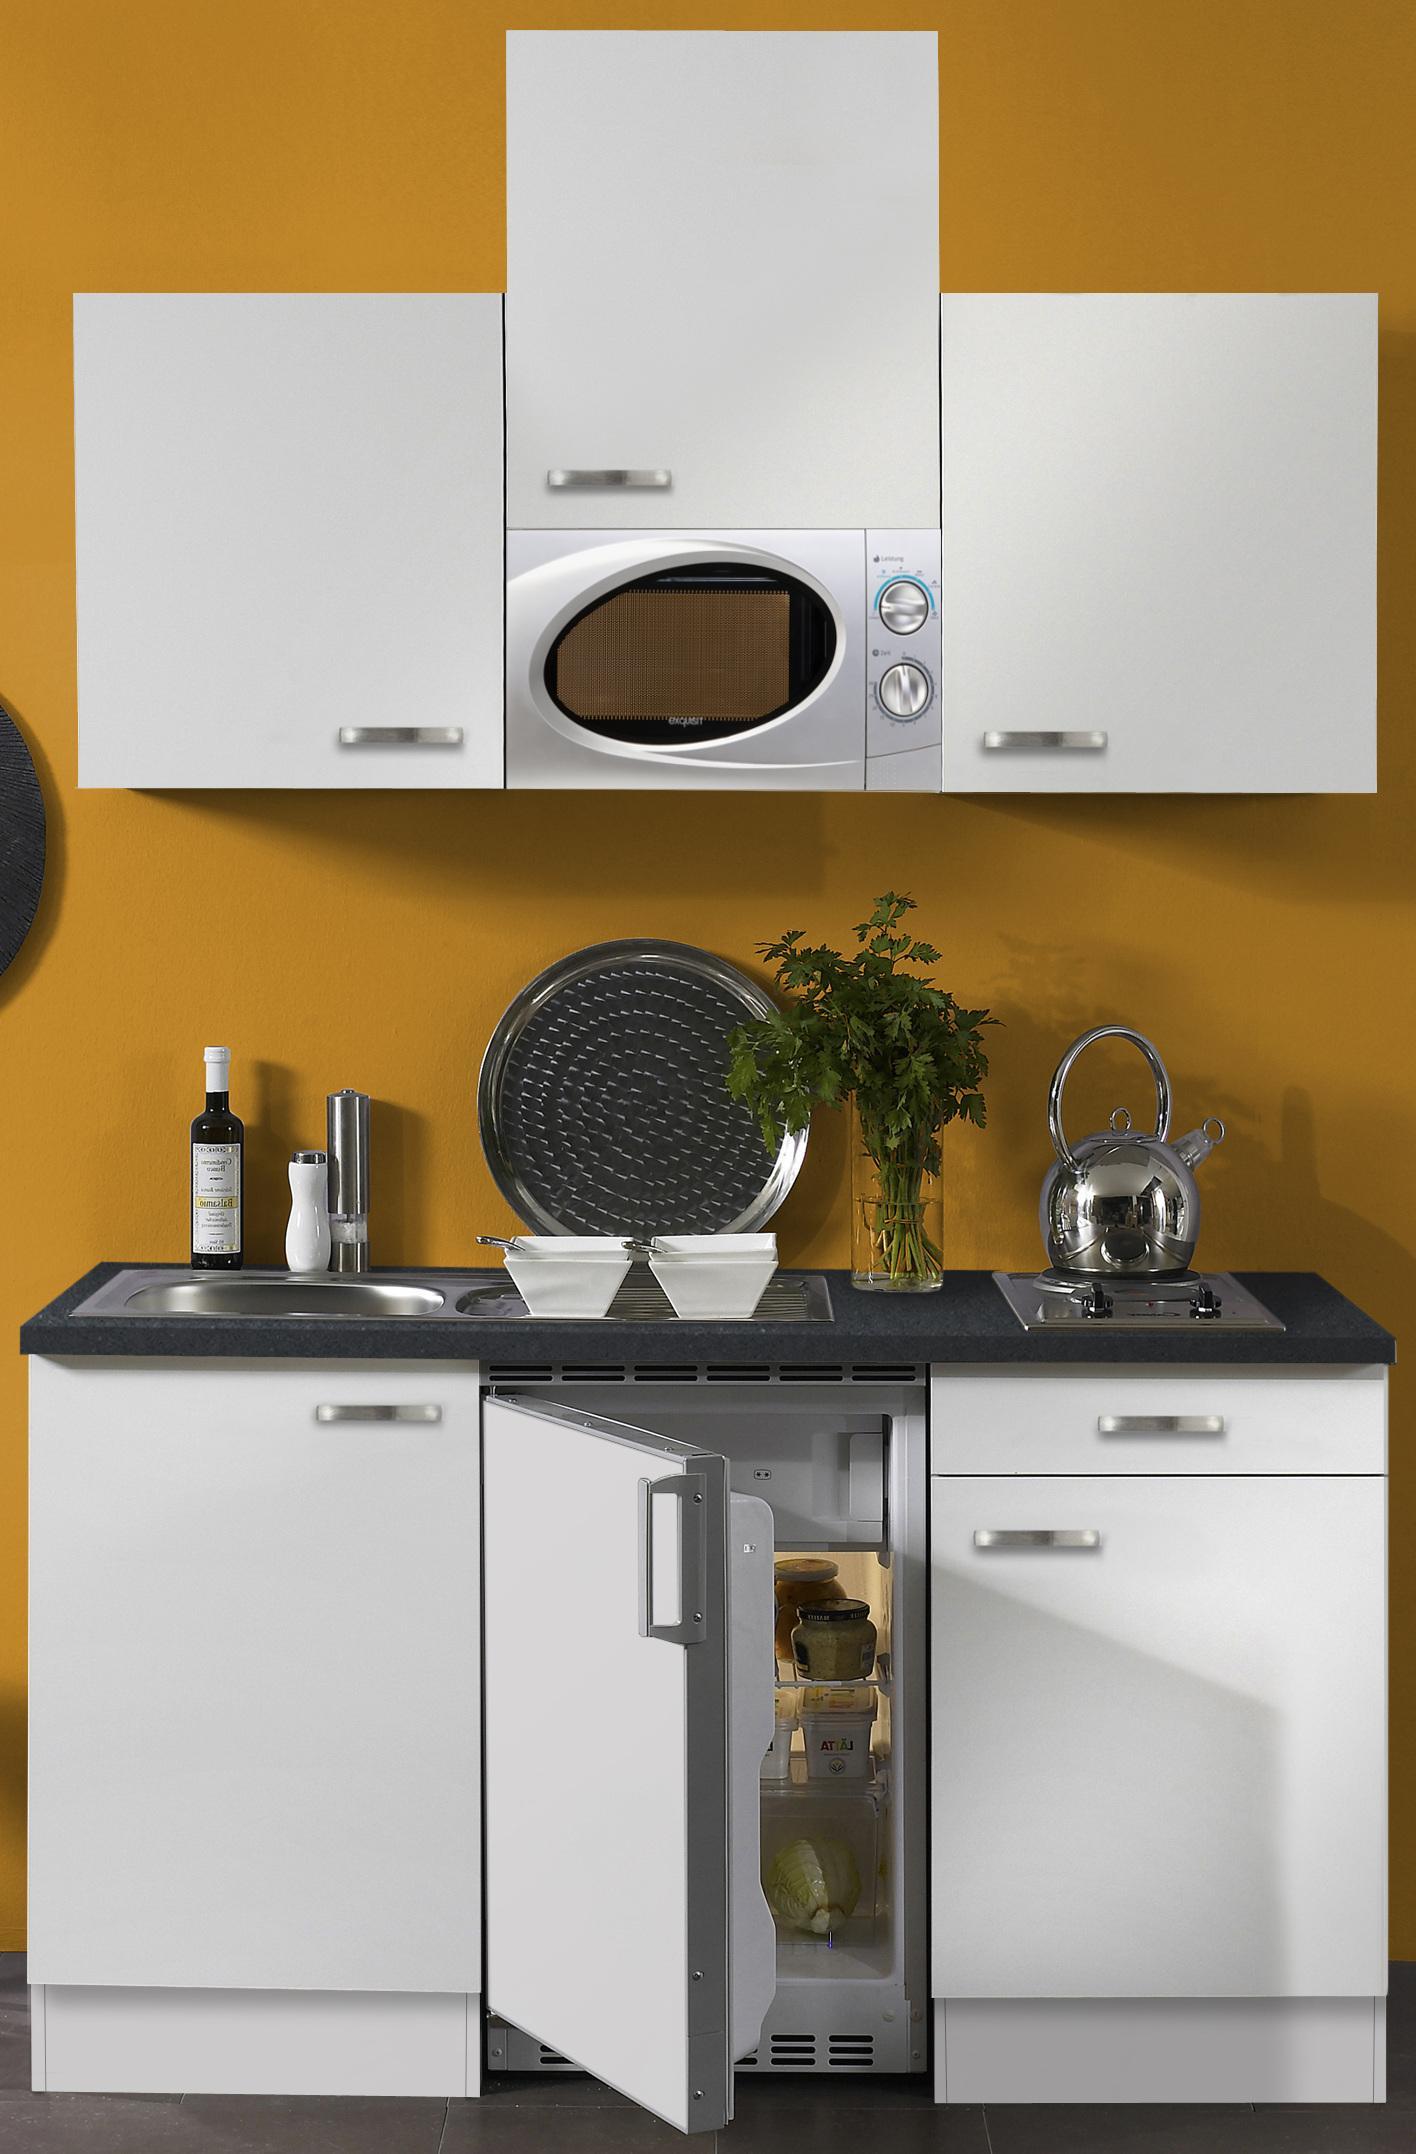 150 Cm Miniküche Mit Kühlschrank